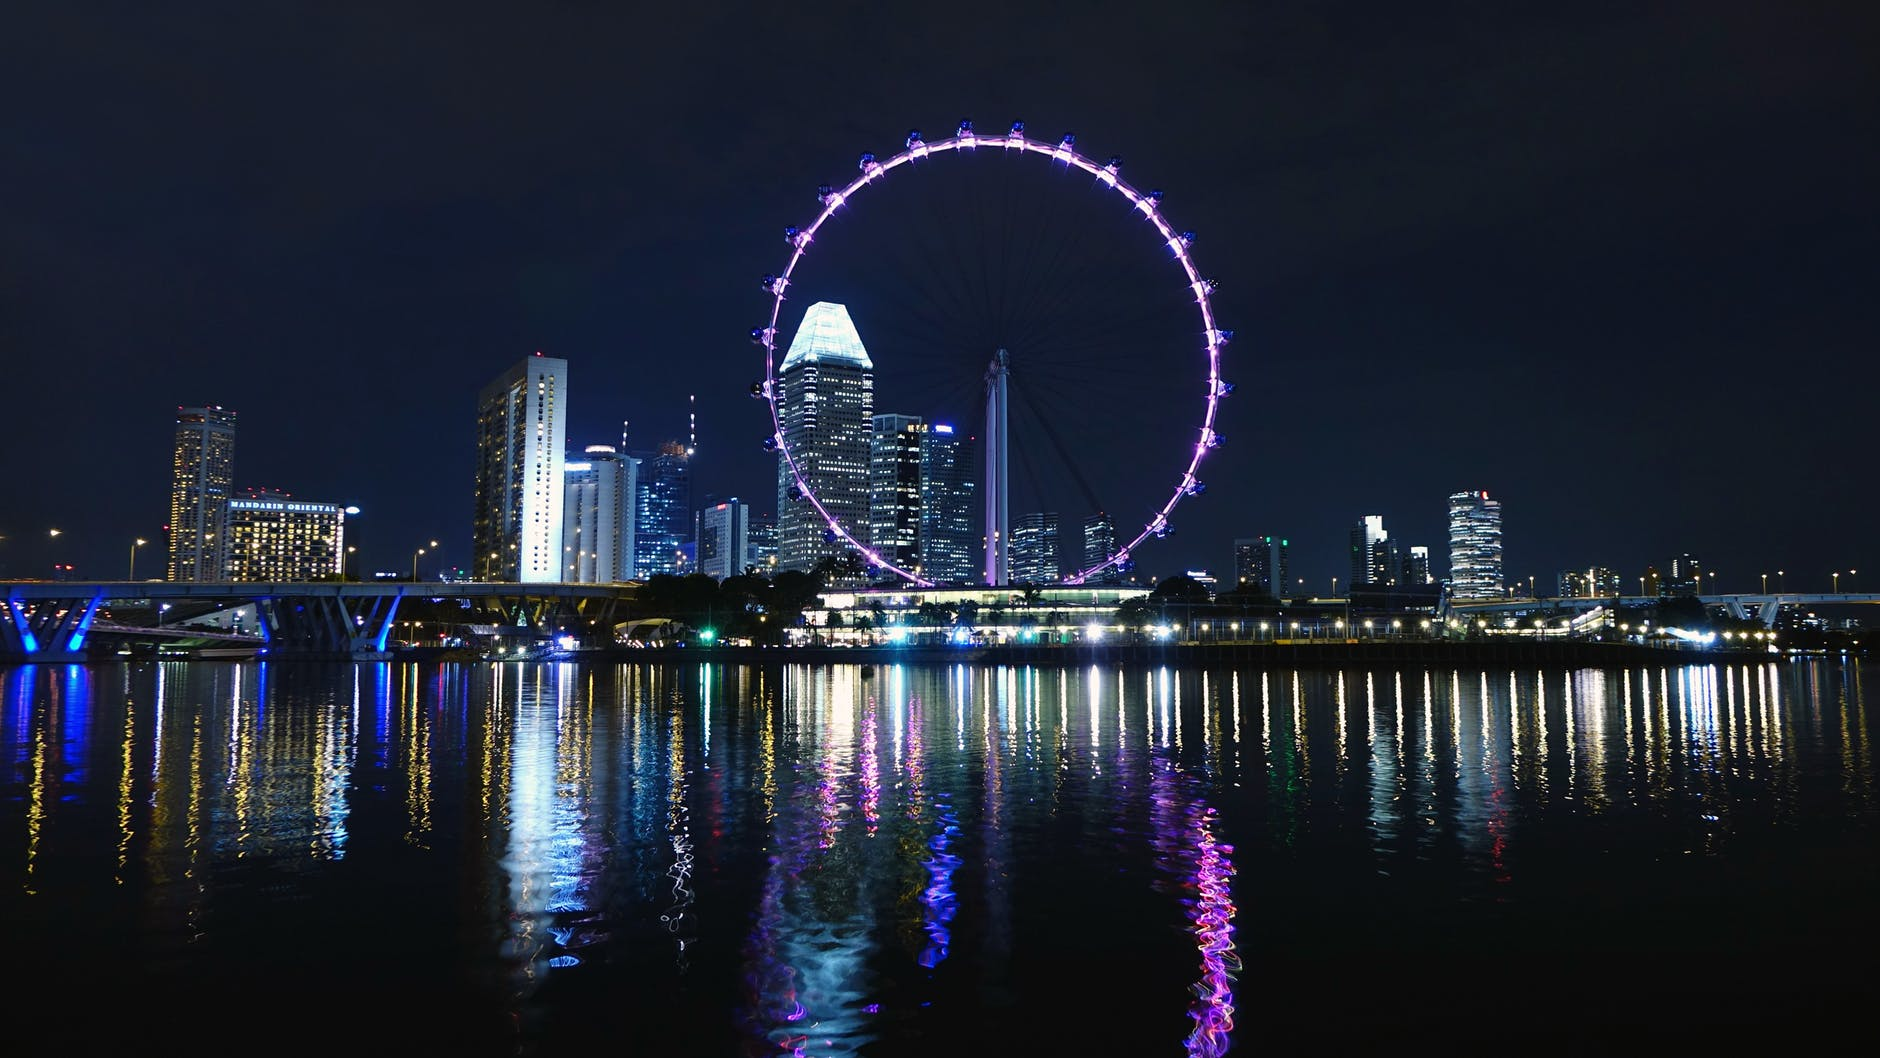 singapore-ferris-wheel-big-wheel-river-52495